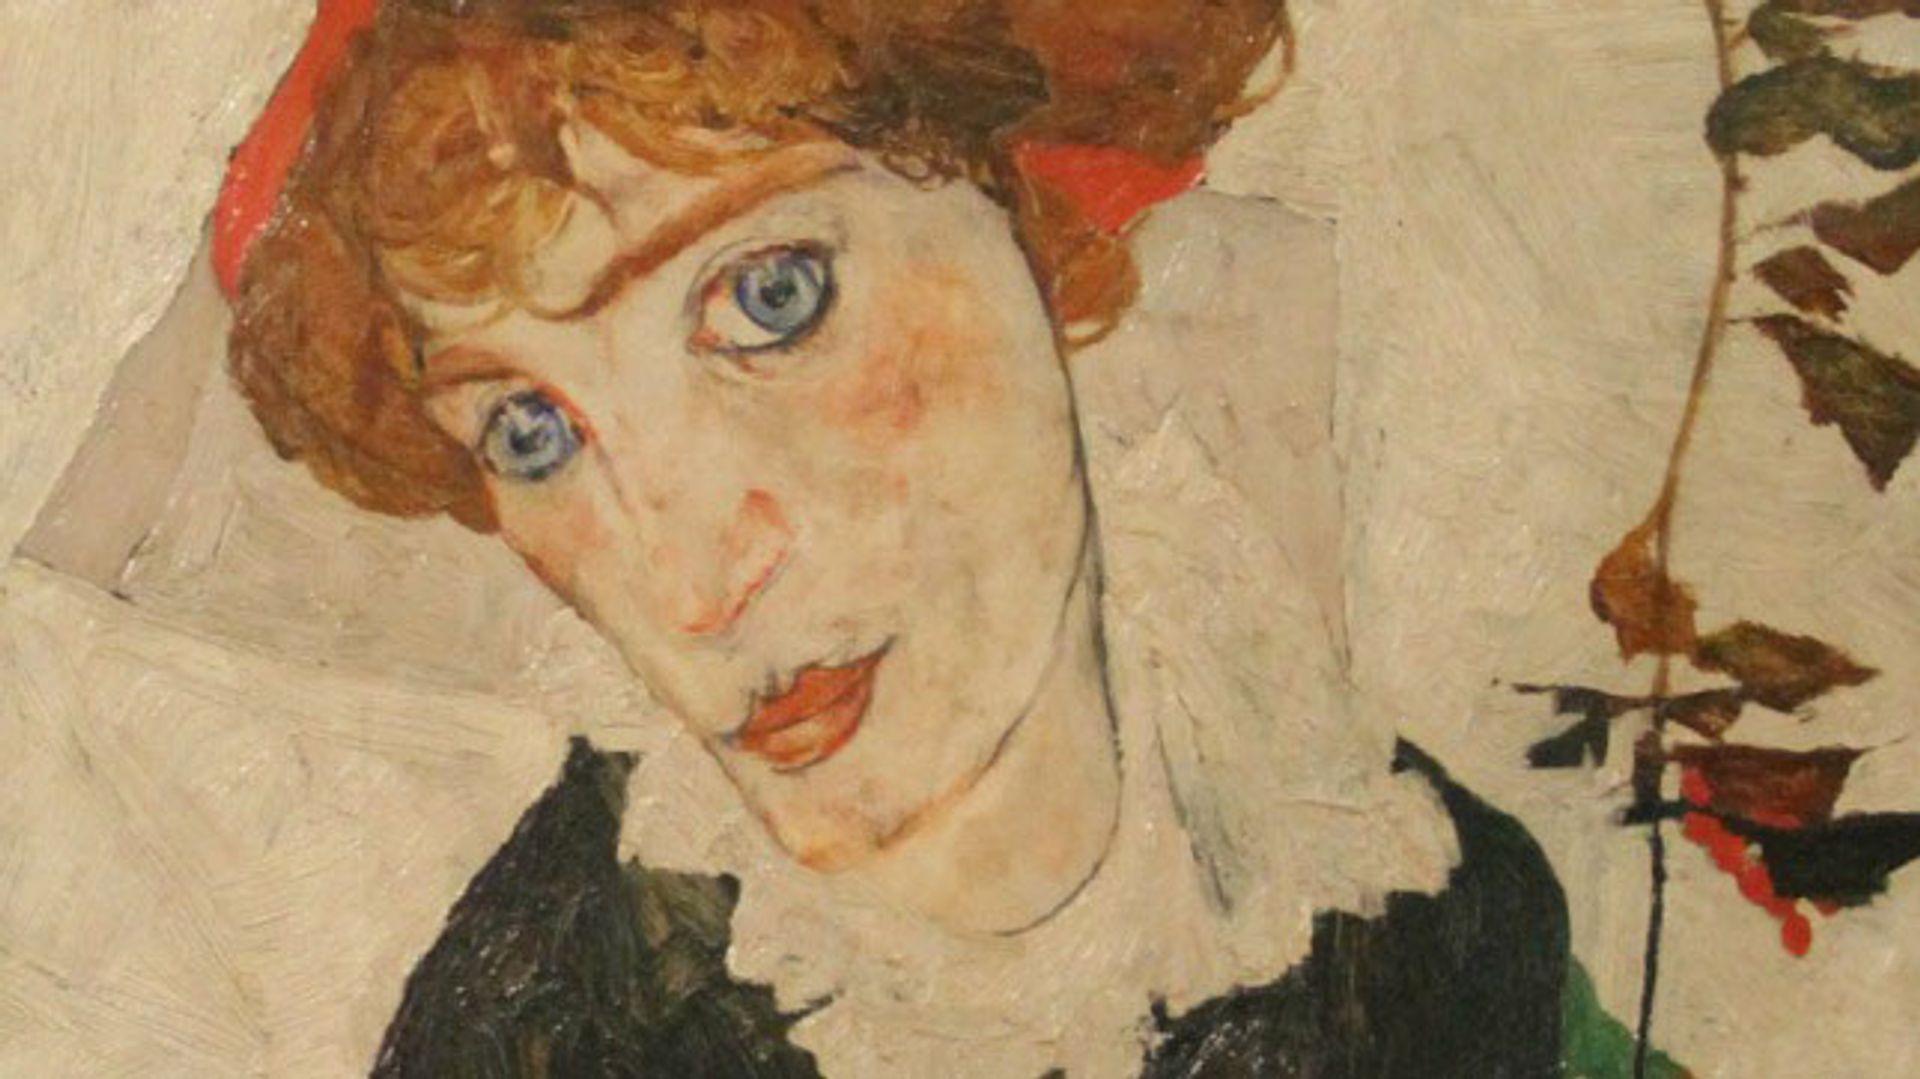 Egon Schiele's Portrait of Wally (1912)